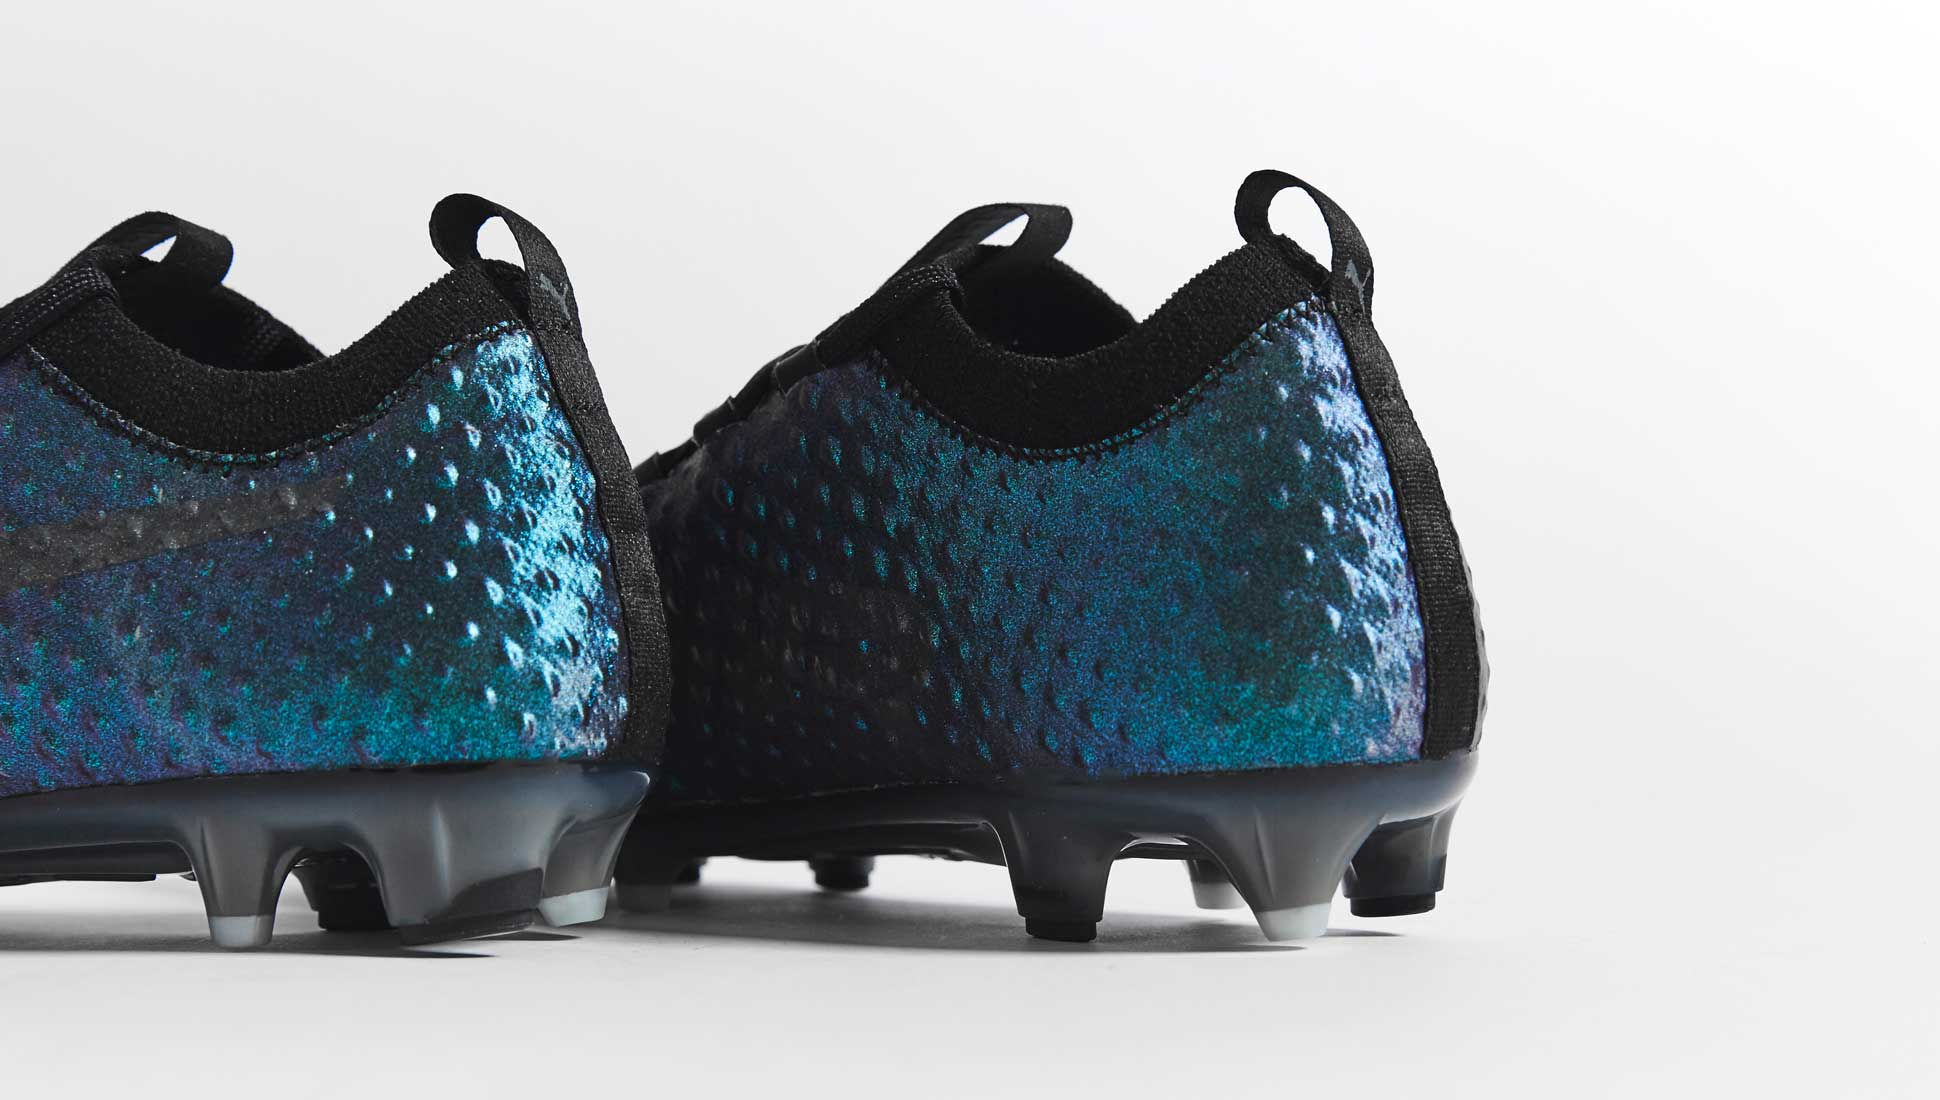 chaussures-football-Puma-evoPower-Vigor-3D-img8